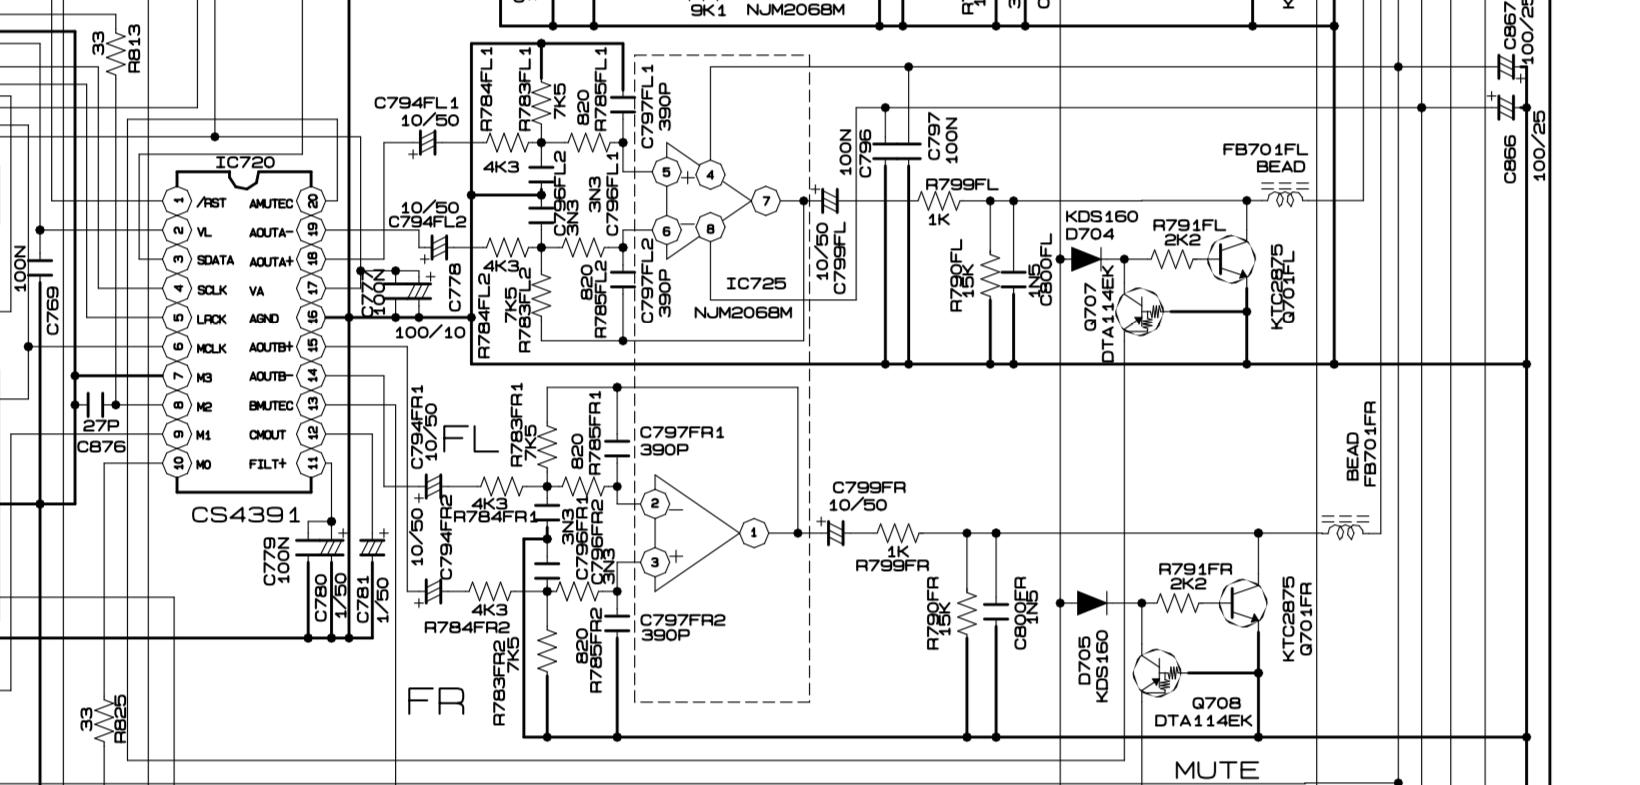 Schematic Marantiz SR5200 / IC720